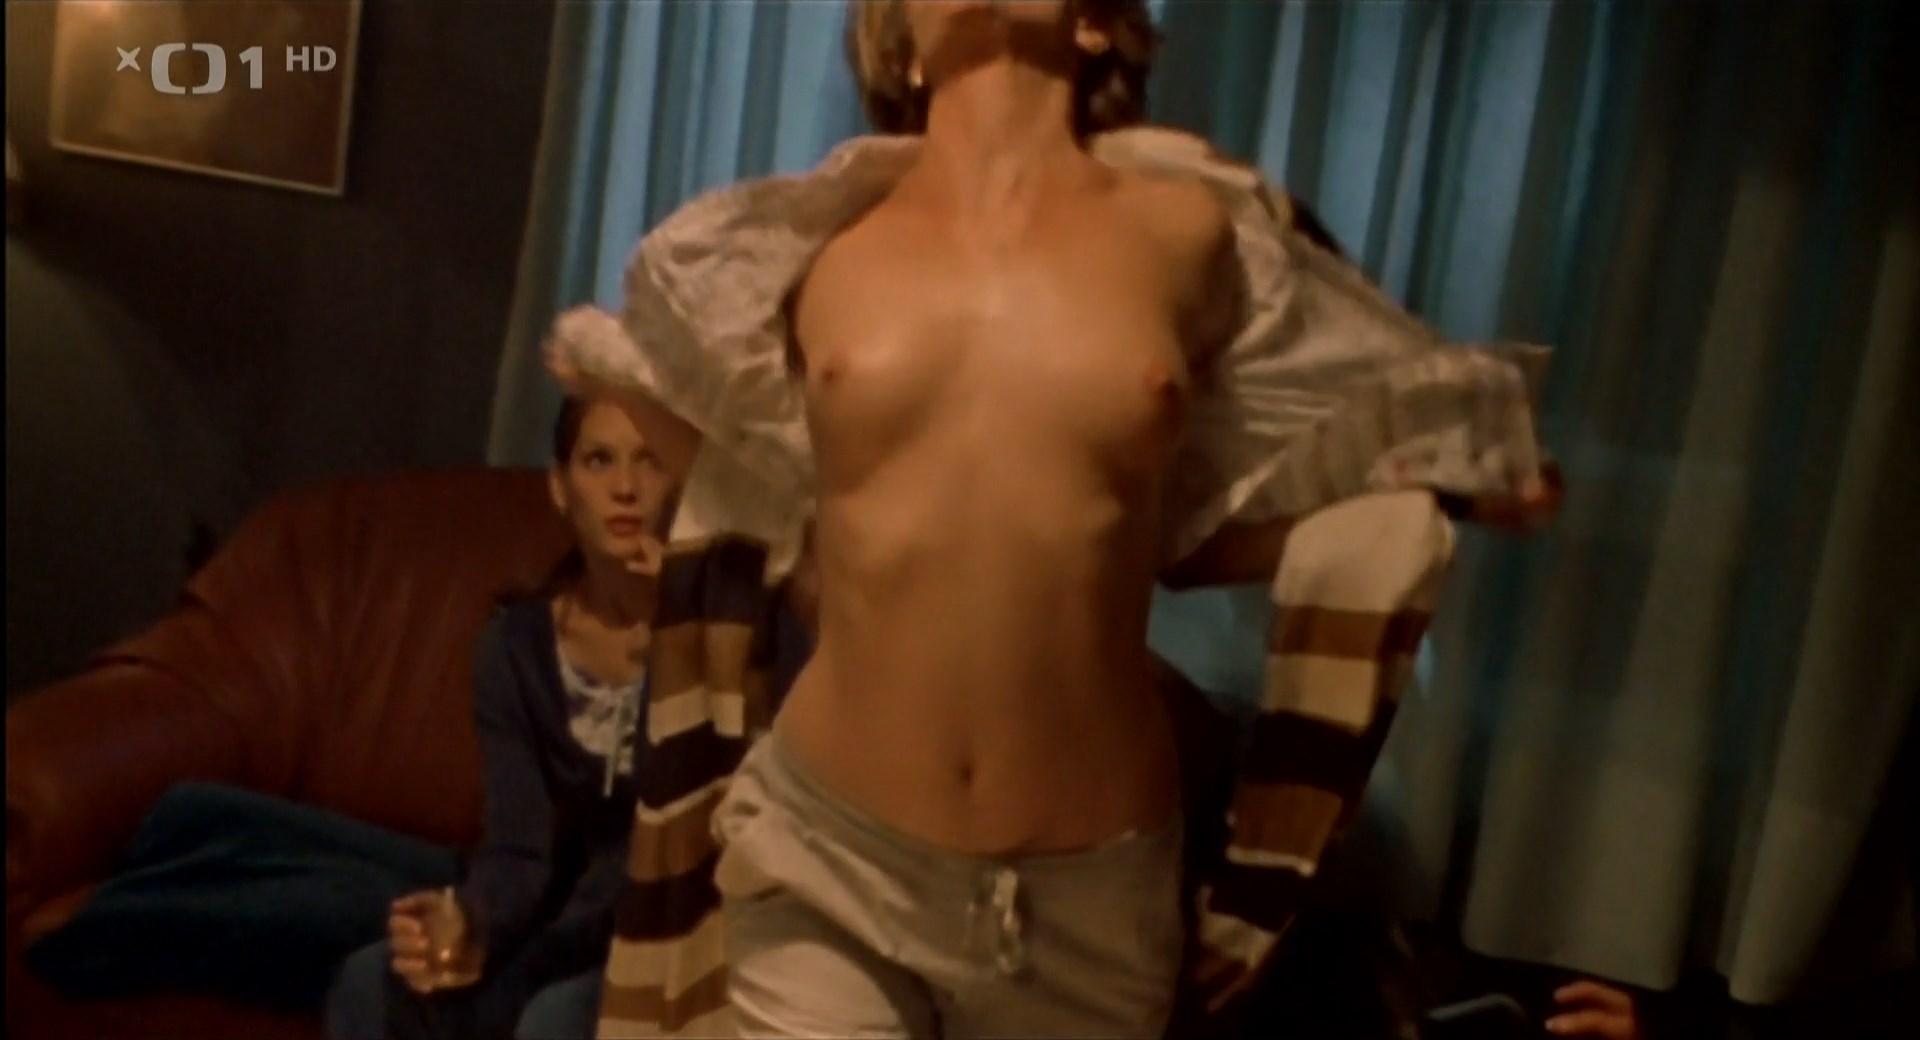 Watch Kristina Asmus Fully Nude Scene video